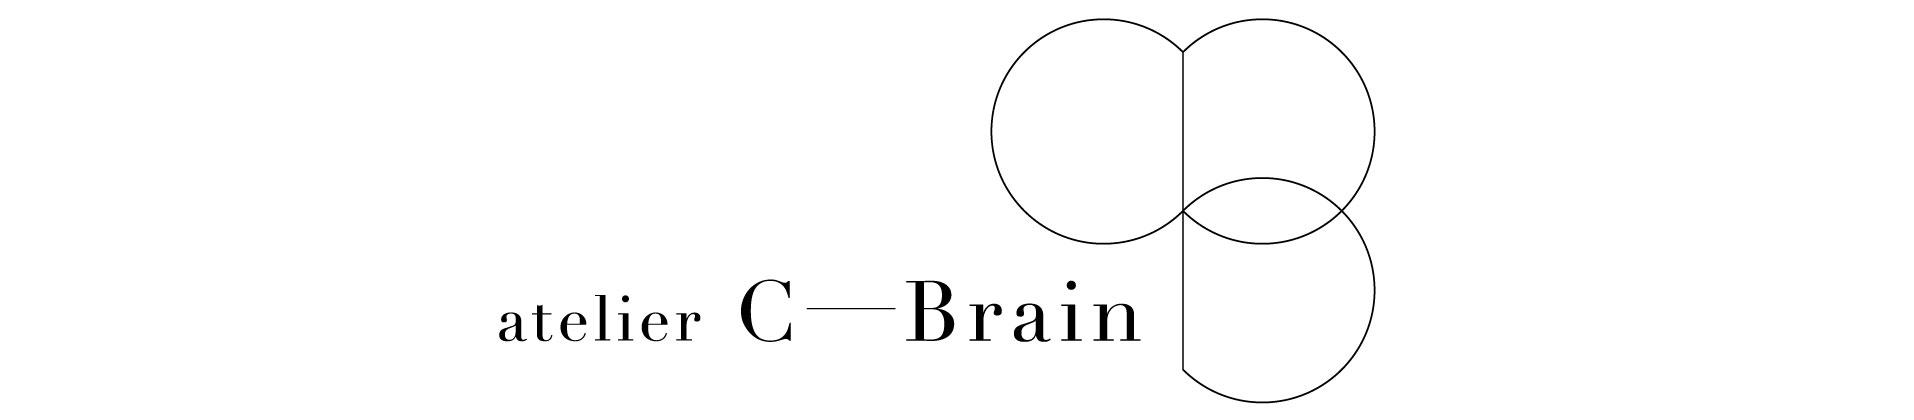 【C−brain シーブレーン公式】 シンプルなハンドメイド腕時計